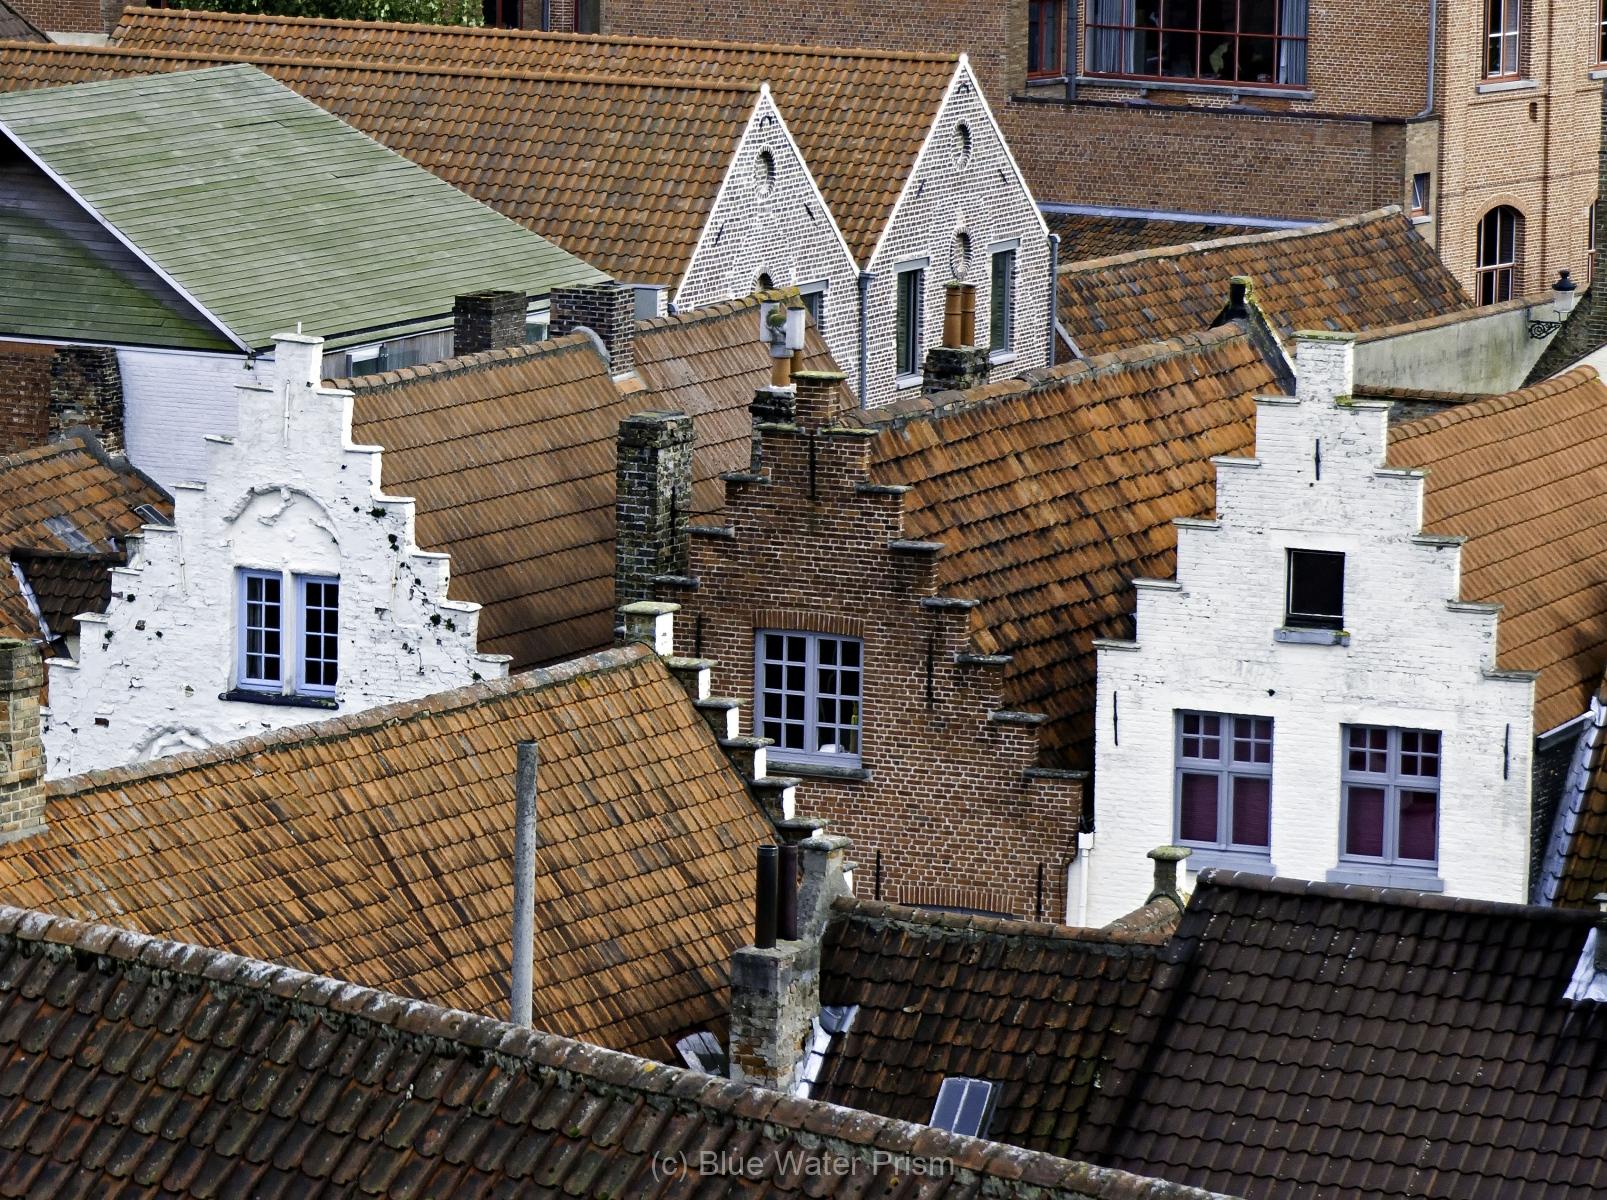 Brugge Rooftops